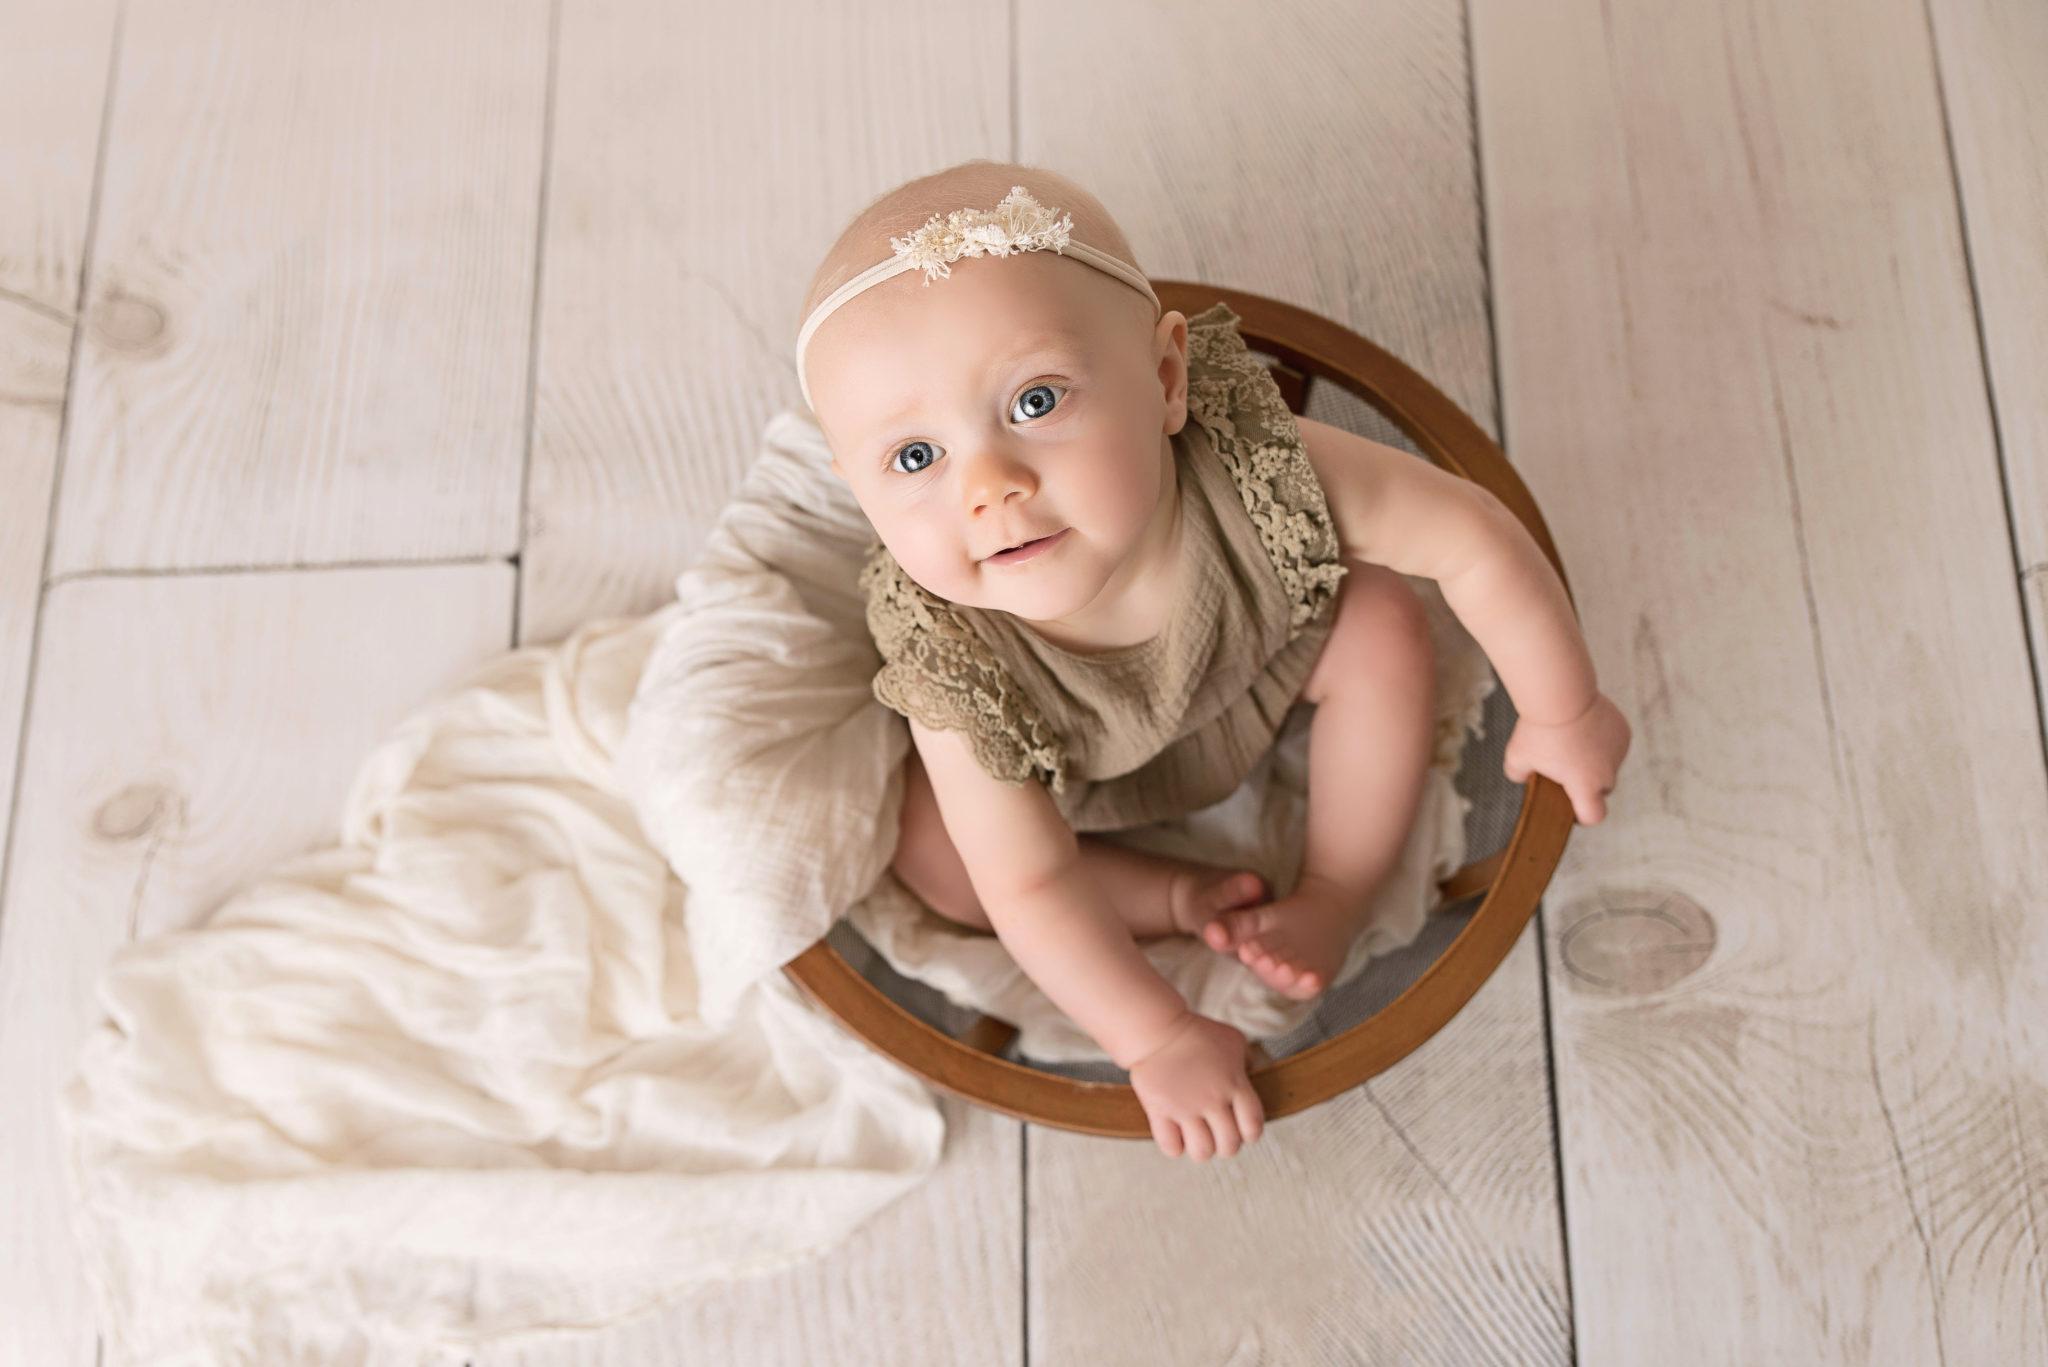 Photographe bébé oise seine et marne val d'oise ainse (11)